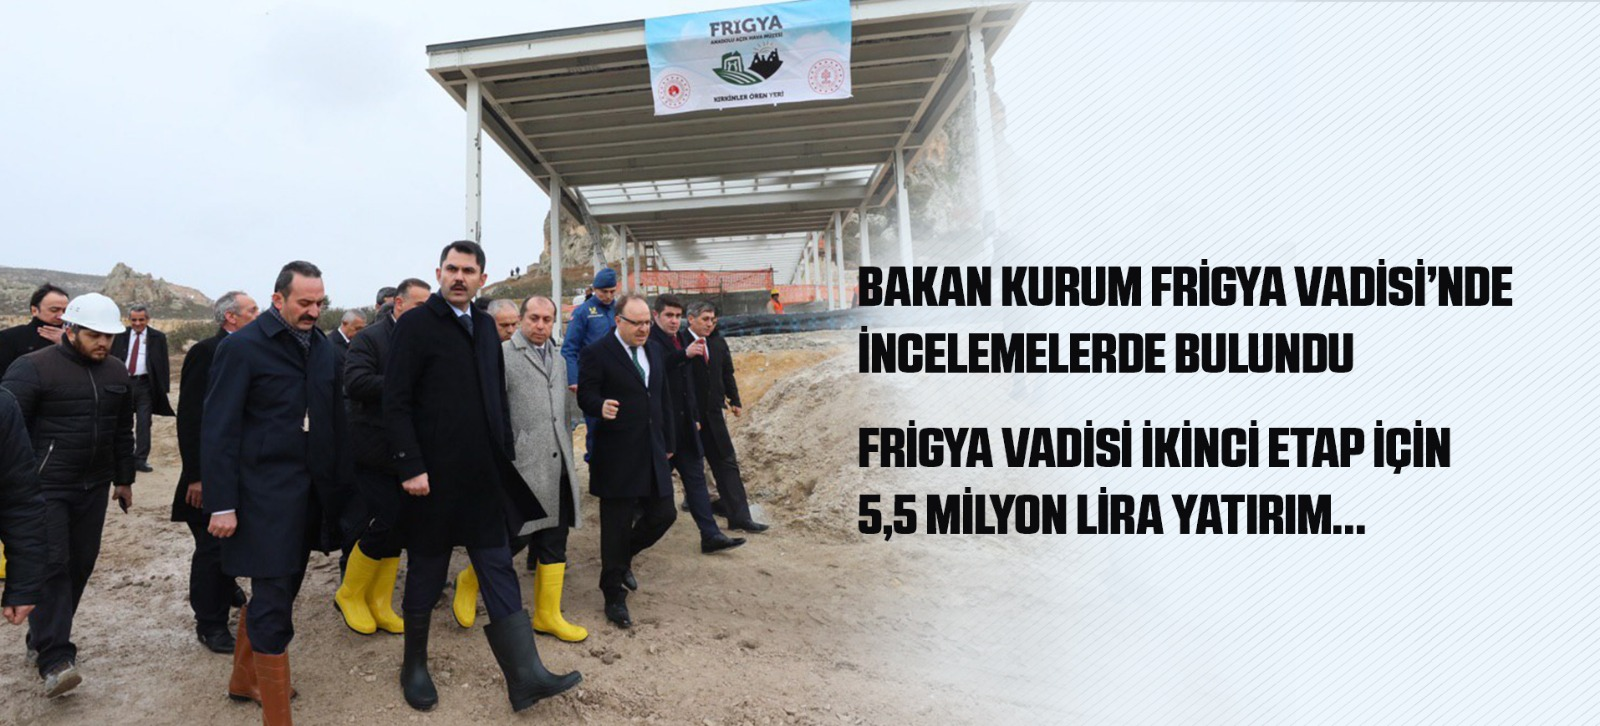 BAKAN KURUM FRİGYA VADİSİ'NDE İNCELEMELERDE BULUNDU